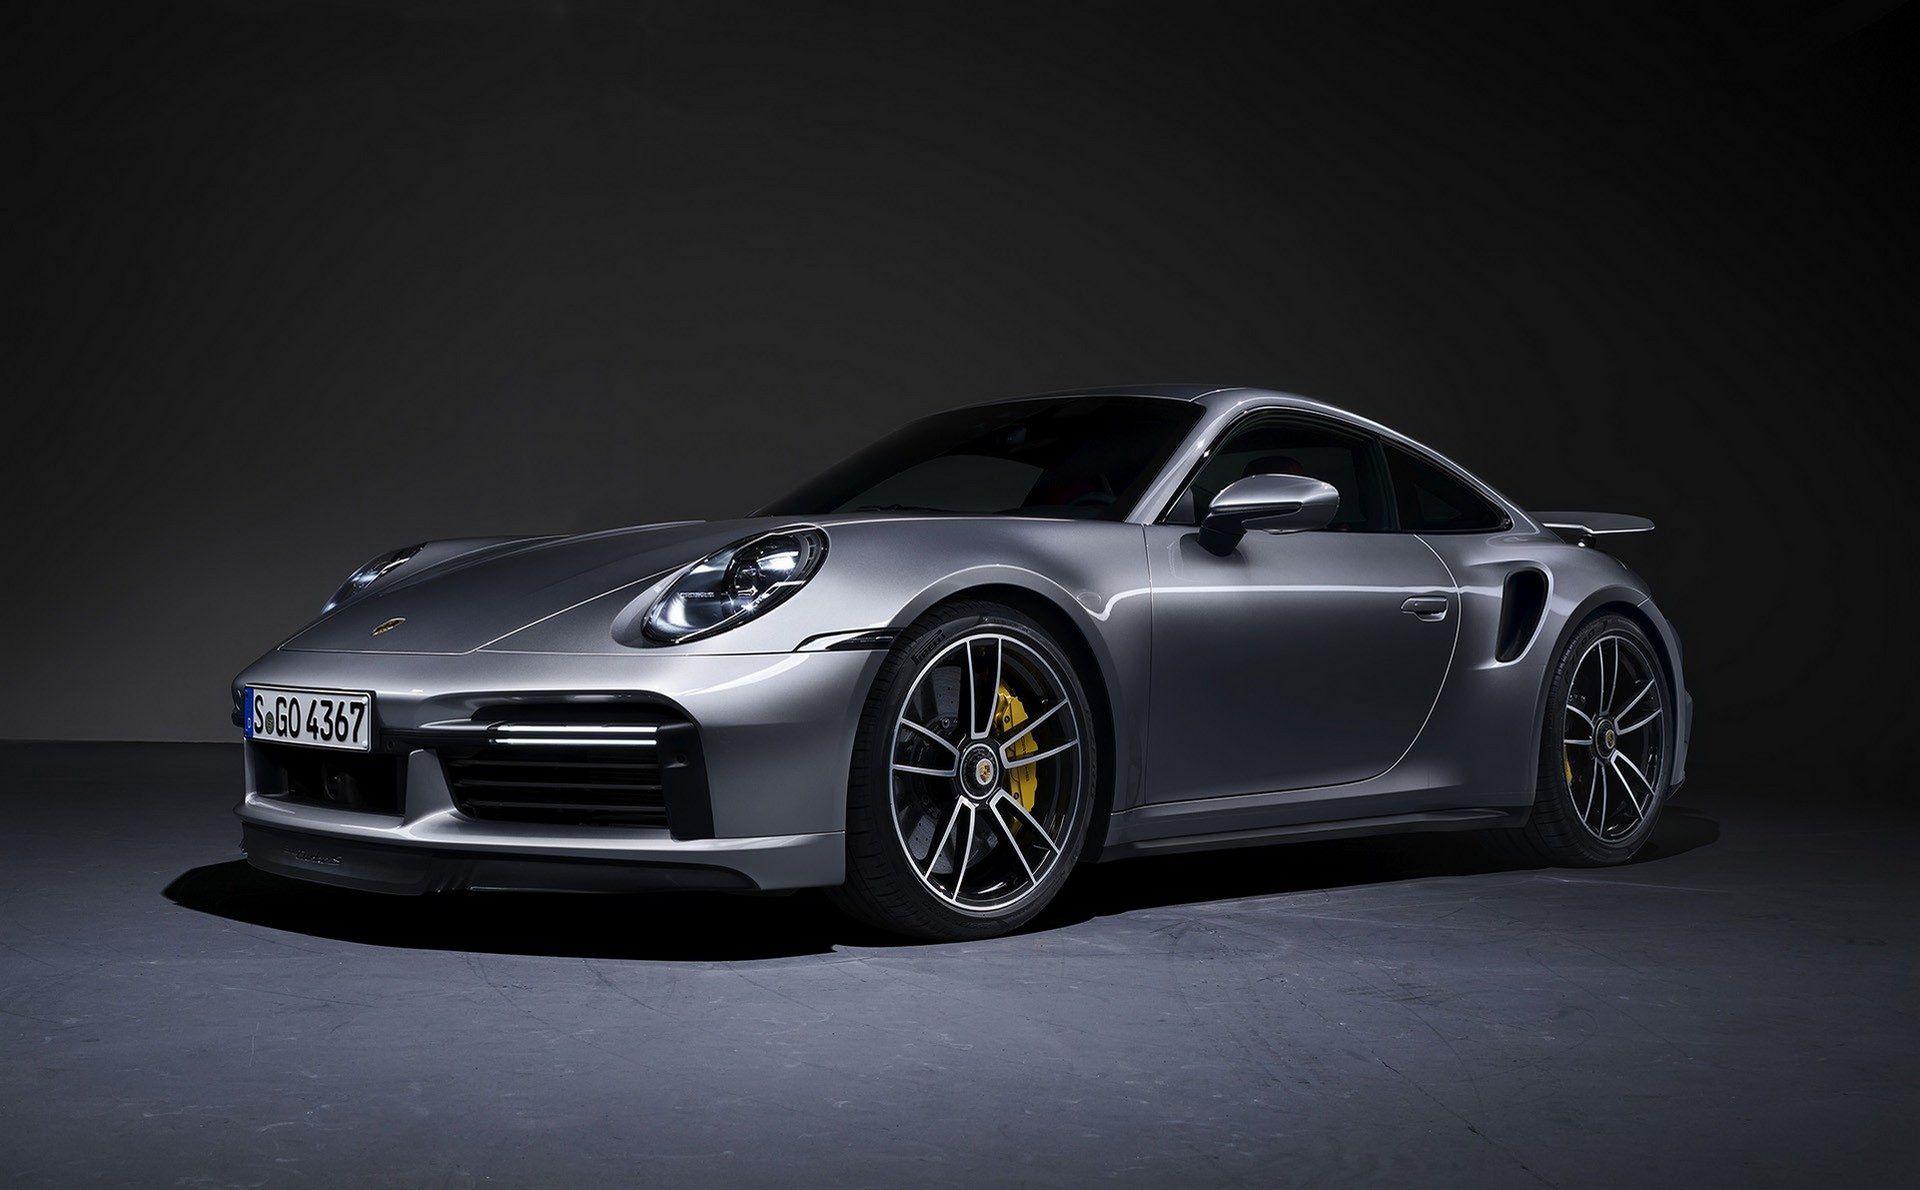 Porsche-911-Turbo-S-2020-25